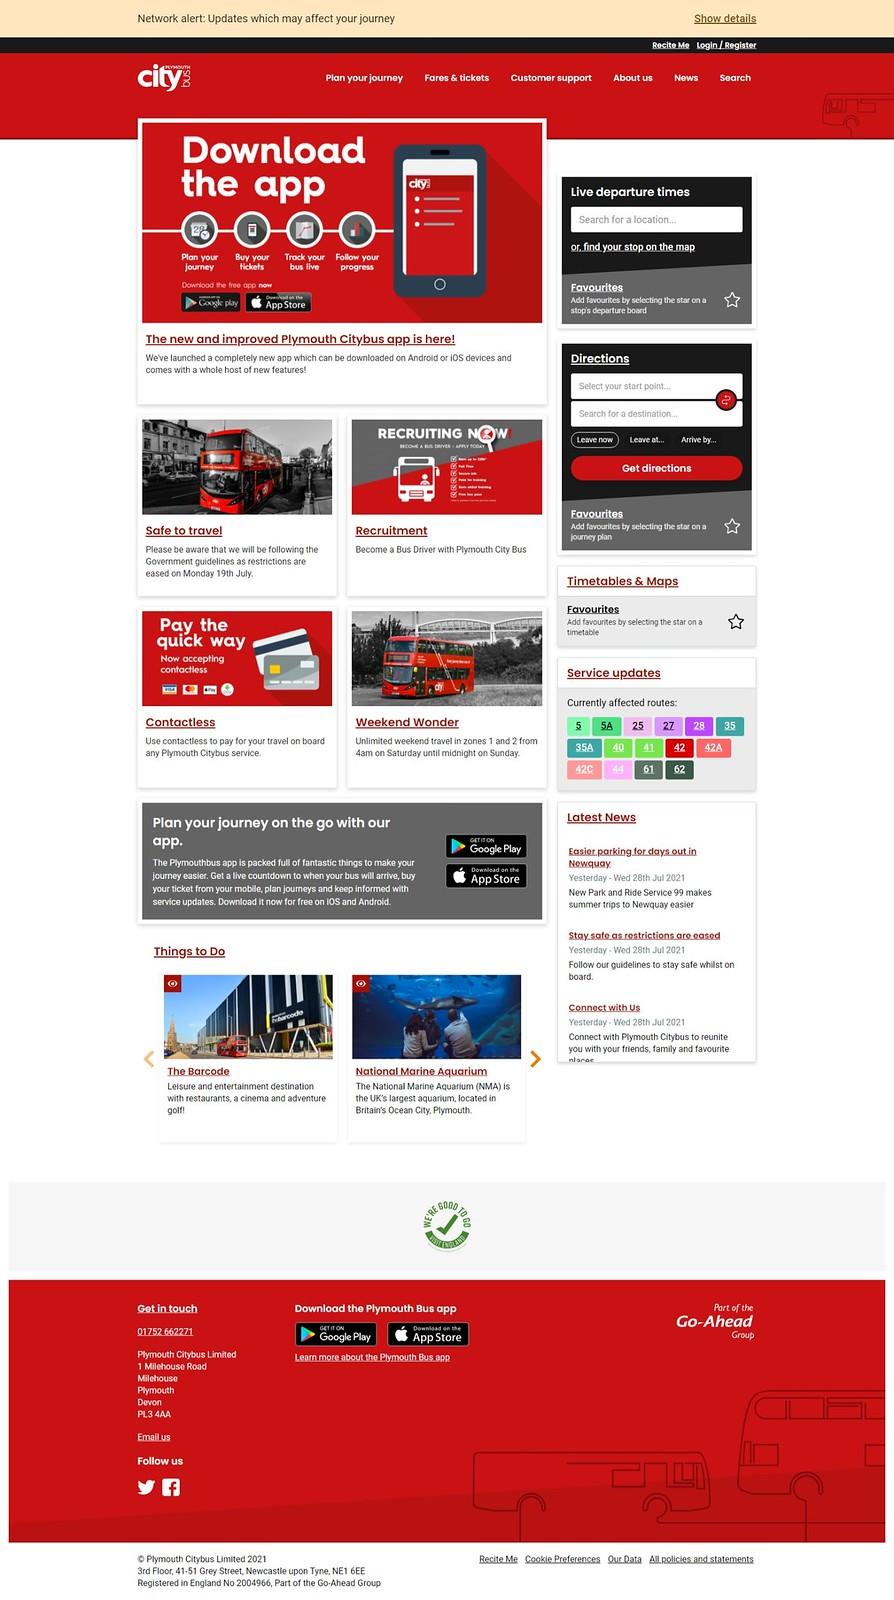 Web capture_29-7-2021_201253_www.plymouthbus.co.uk